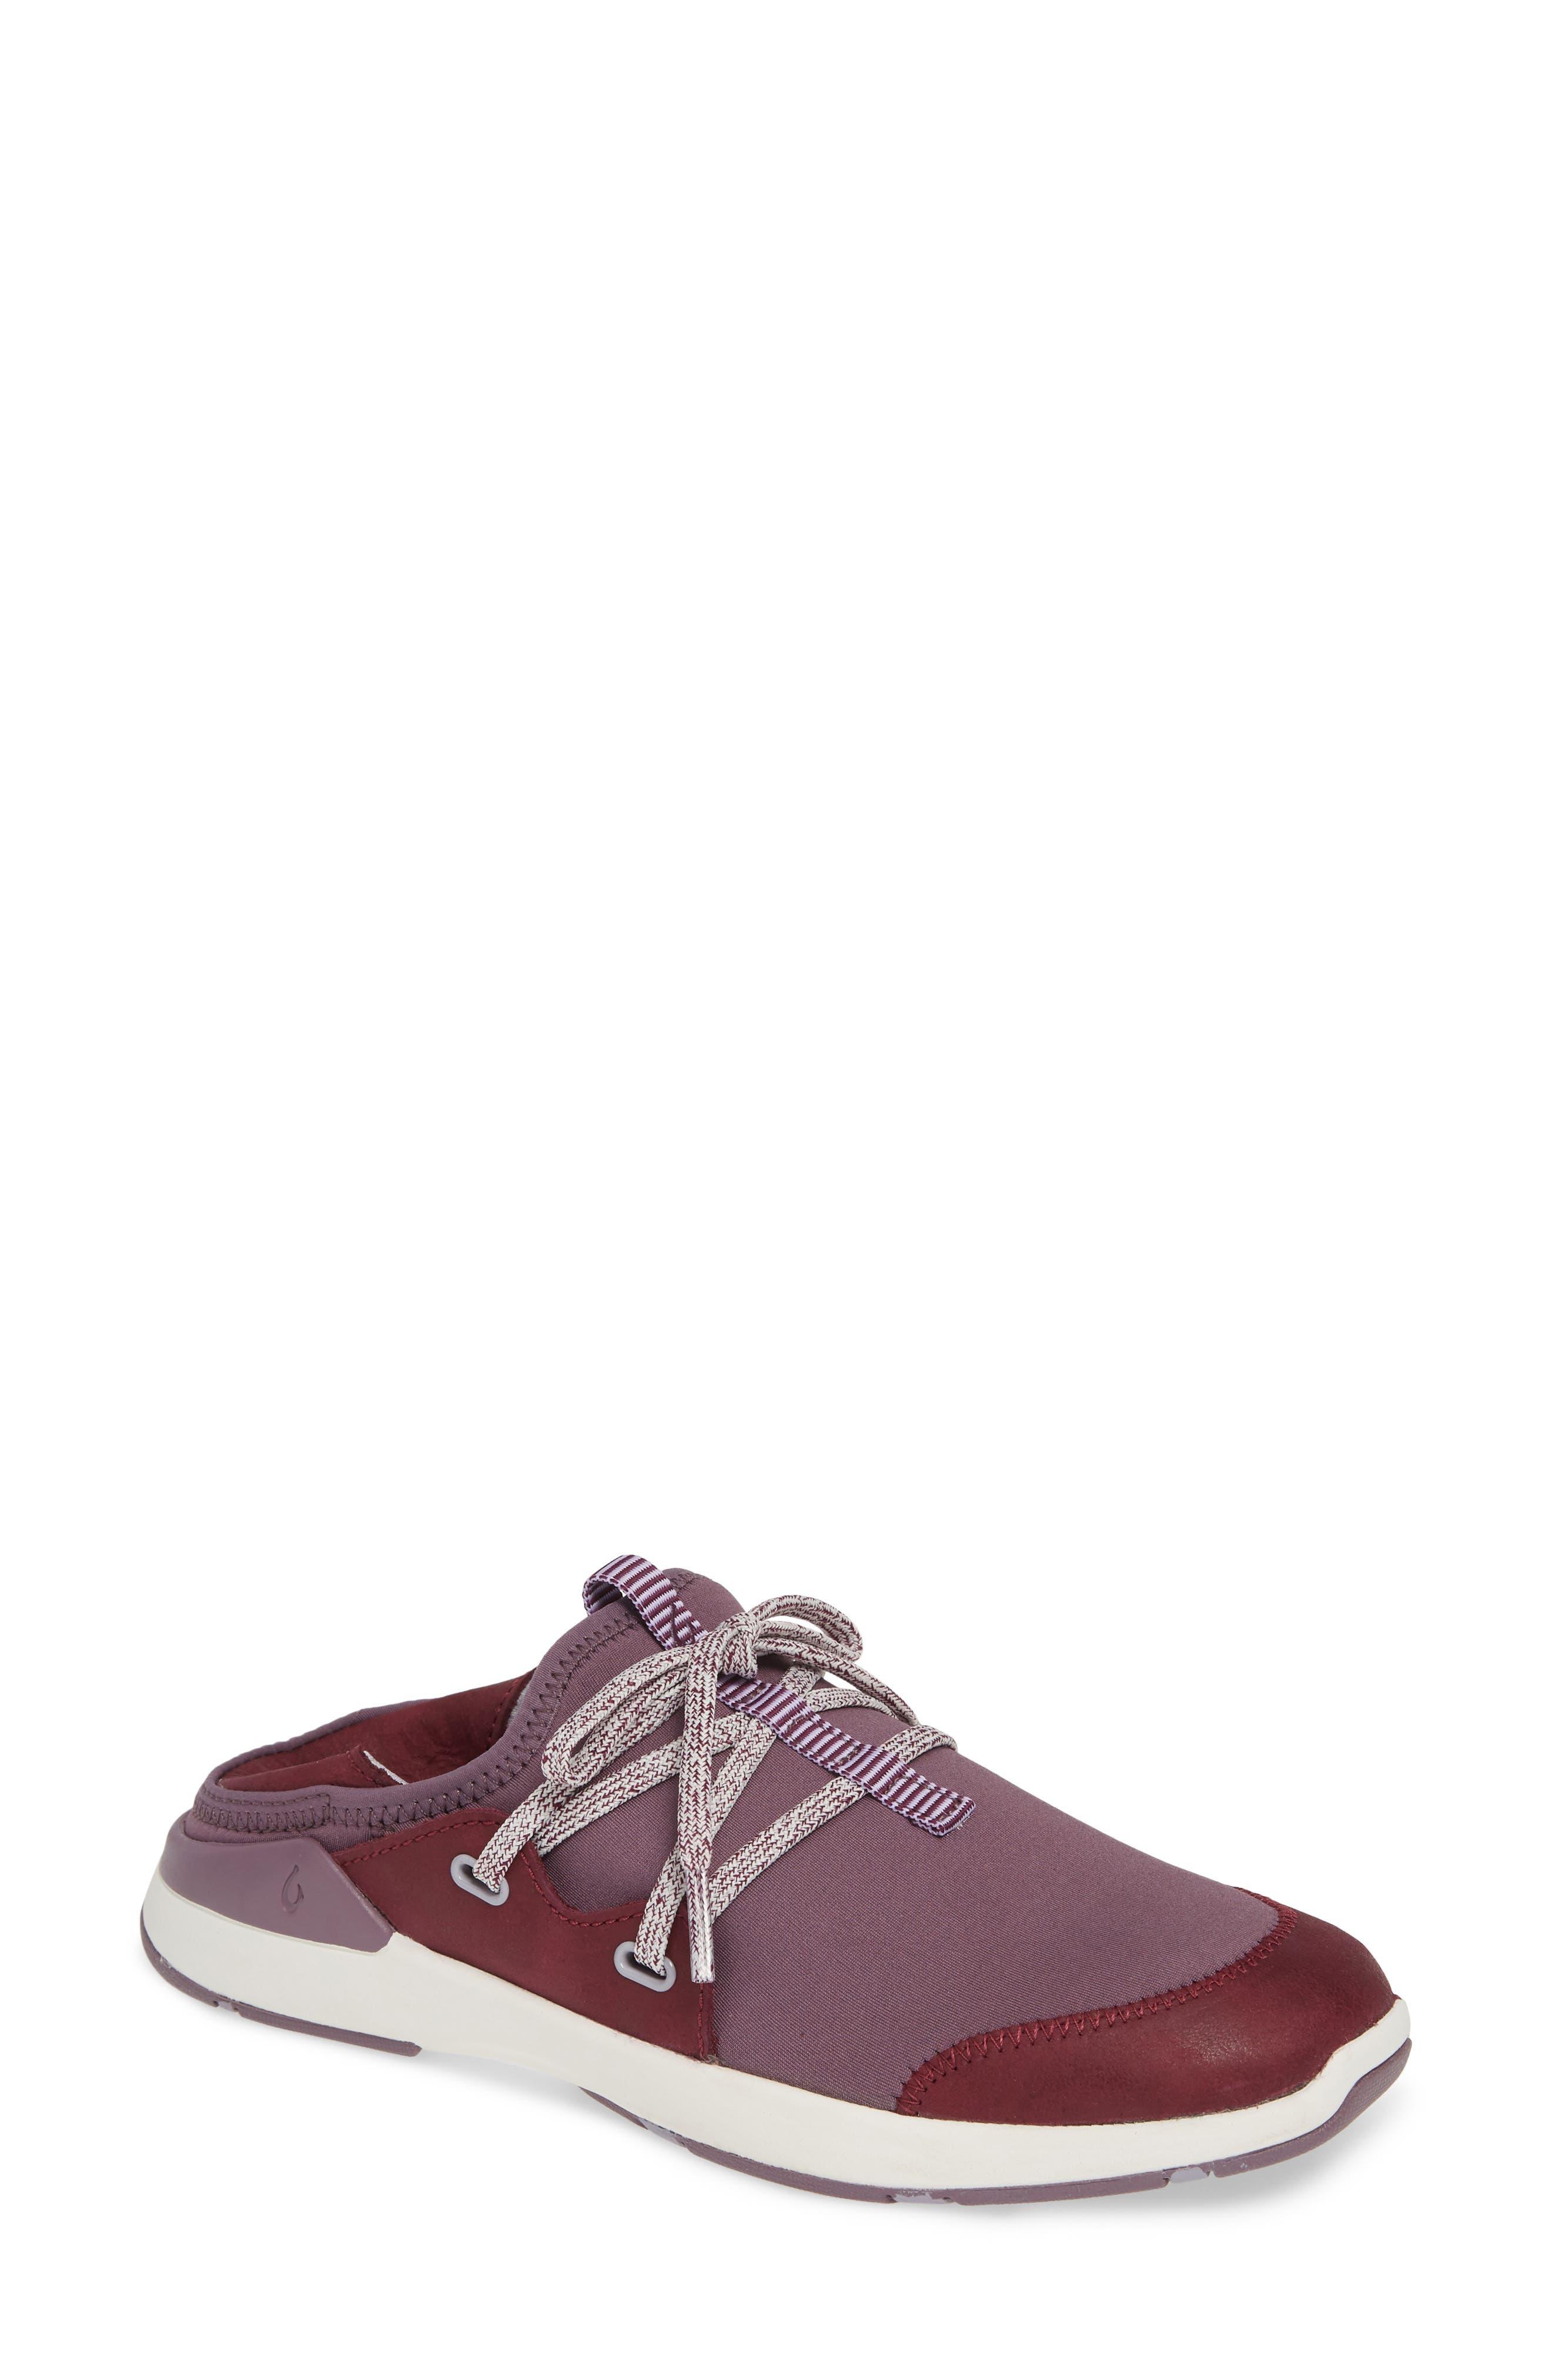 Olukai Miki Li Convertible Sneaker- Burgundy